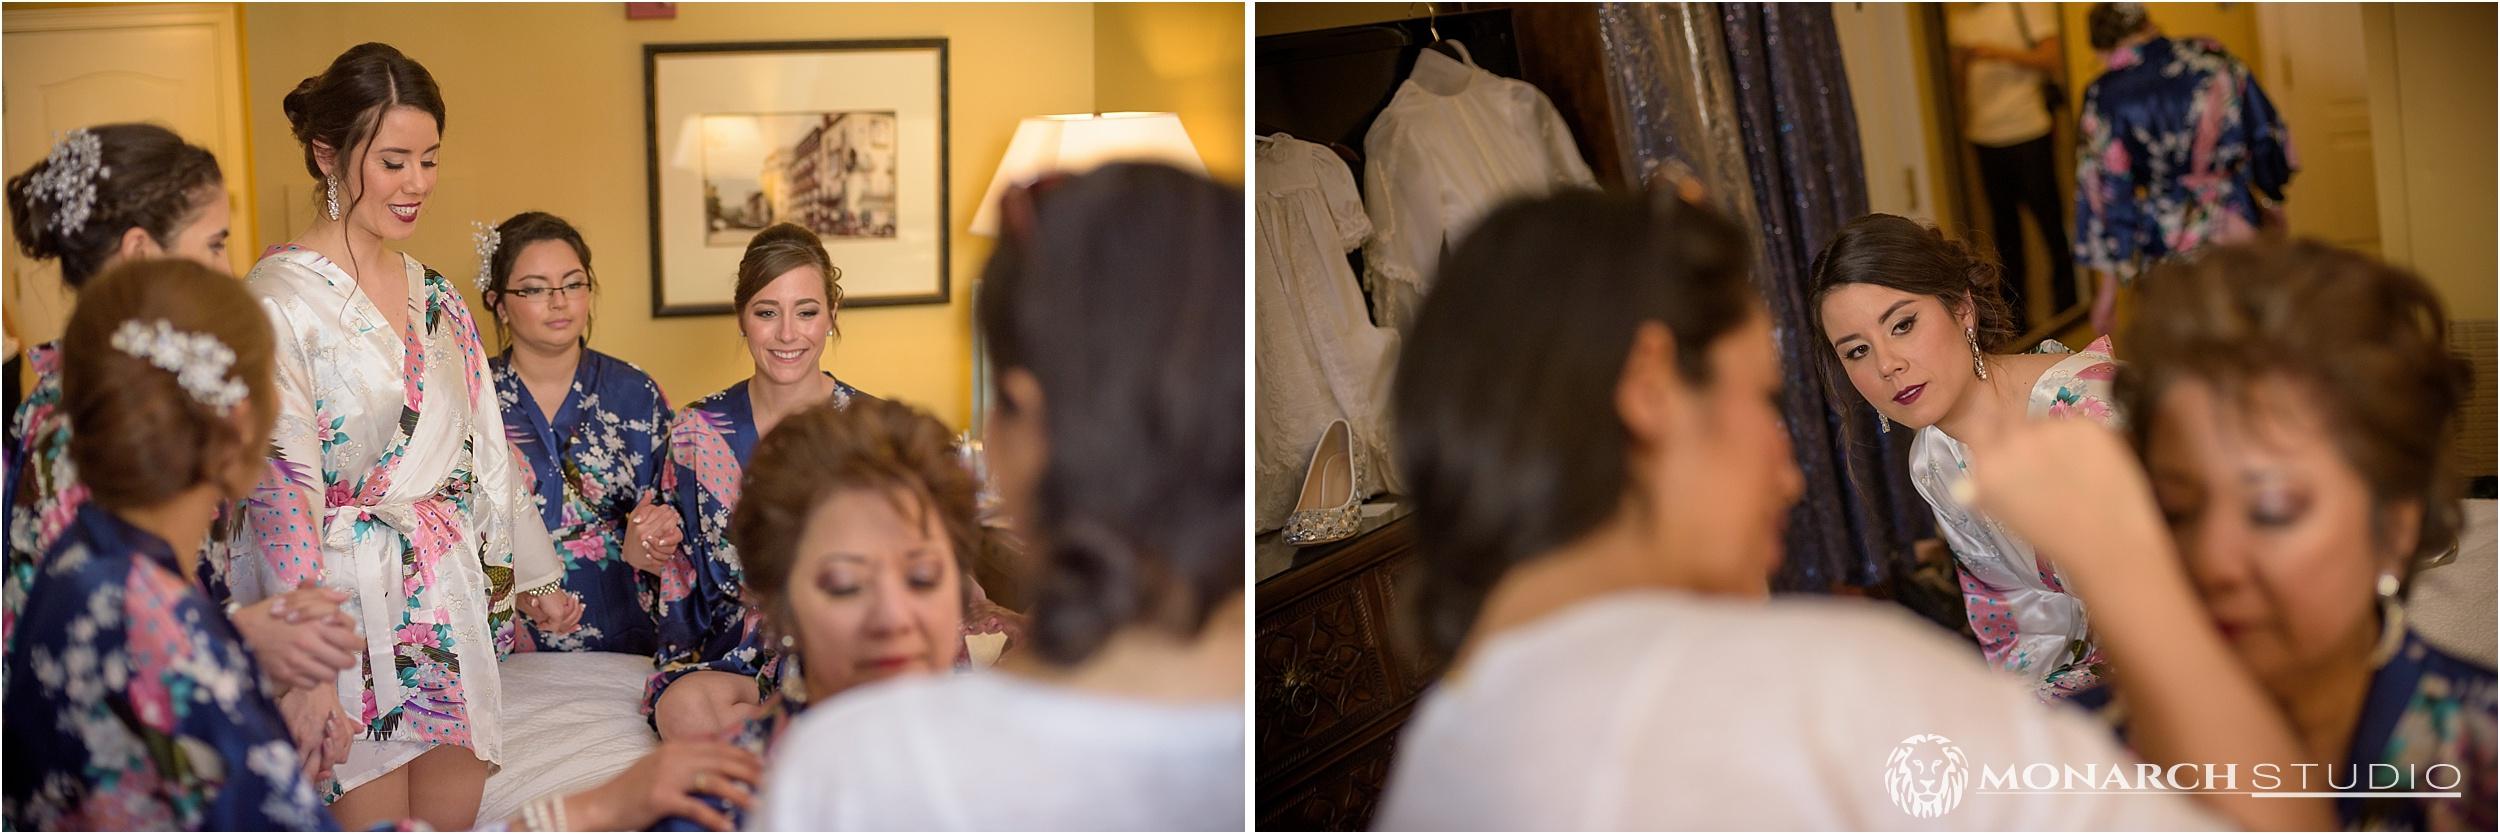 wedding-photographer-in-st-augustine-florida-treasury-003.jpg